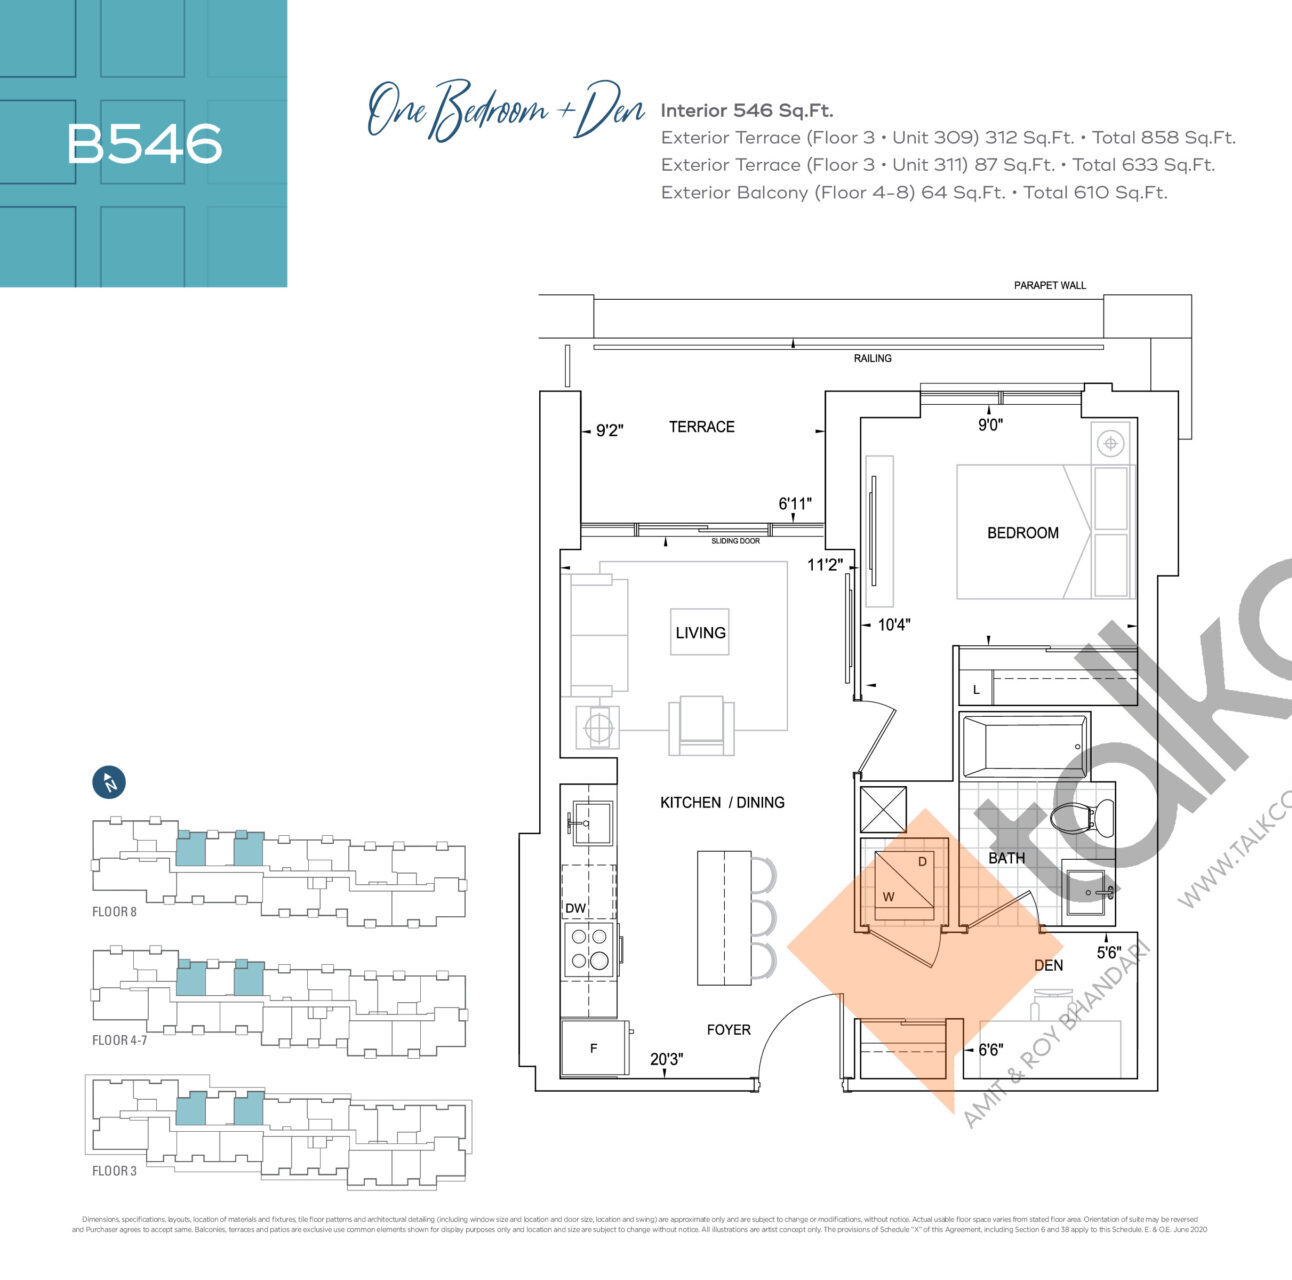 B546 Floor Plan at Dunwest Condos - 546 sq.ft